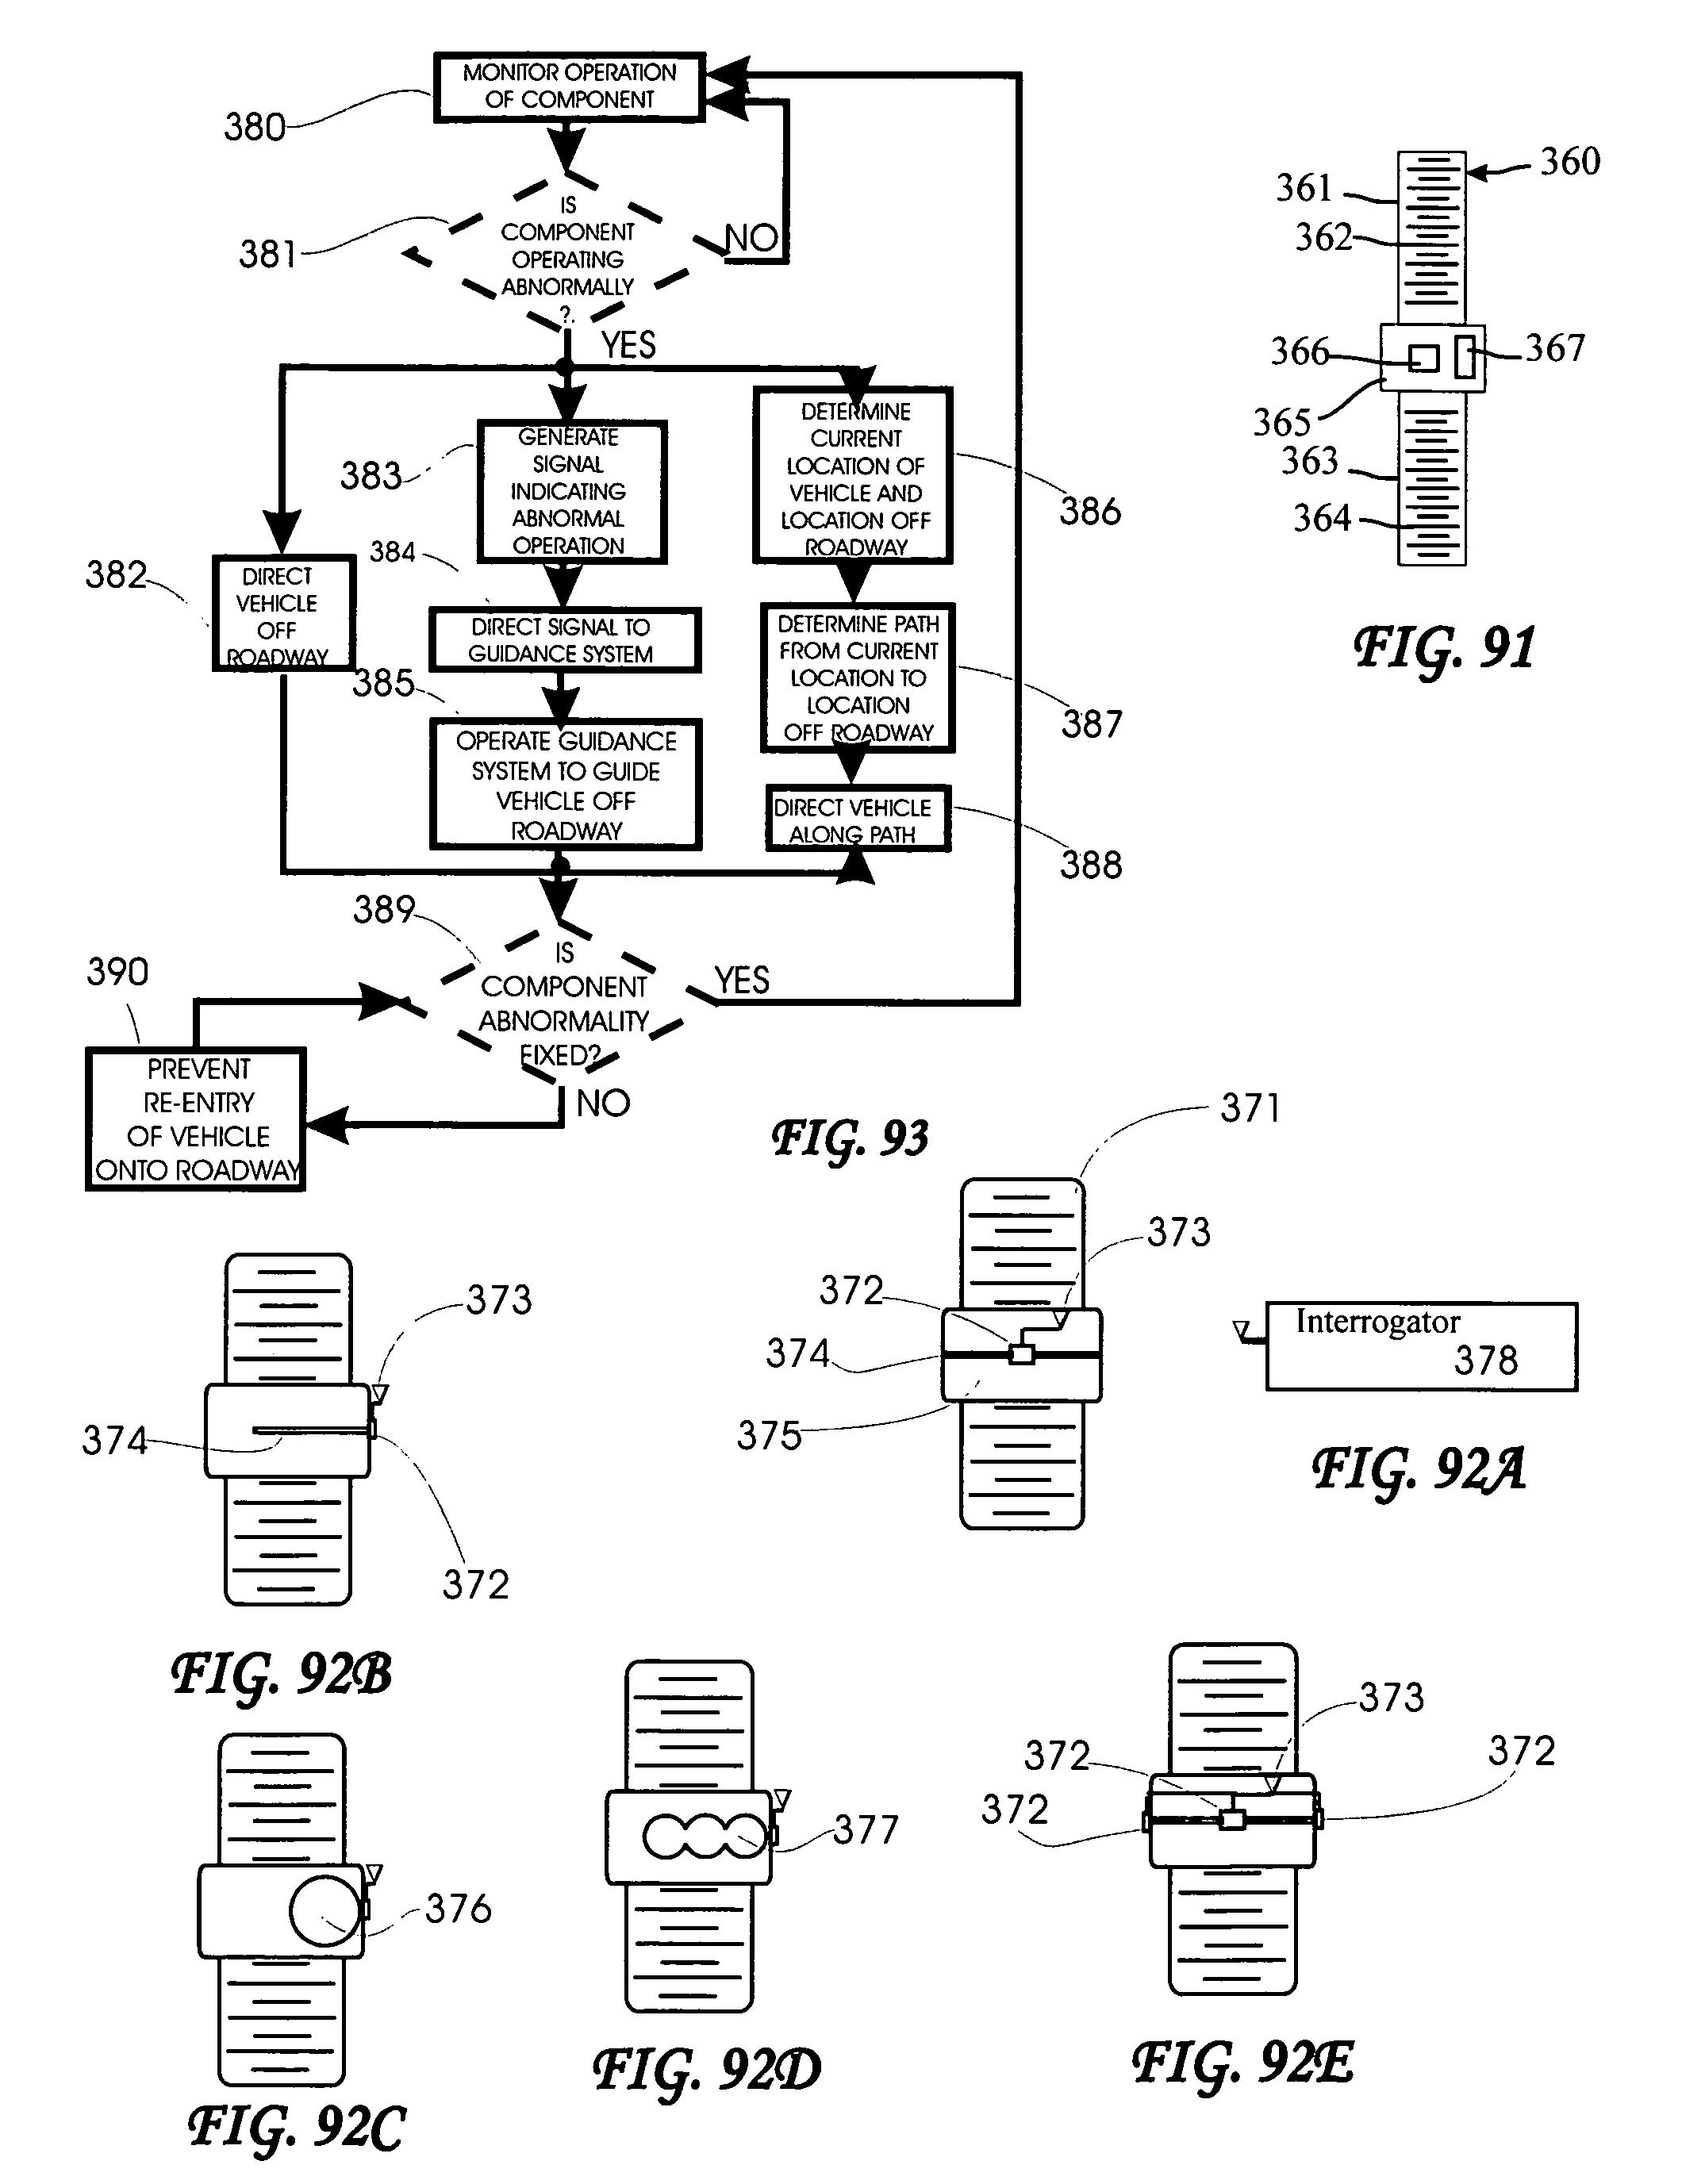 Patent US 7,103,460 B1 on